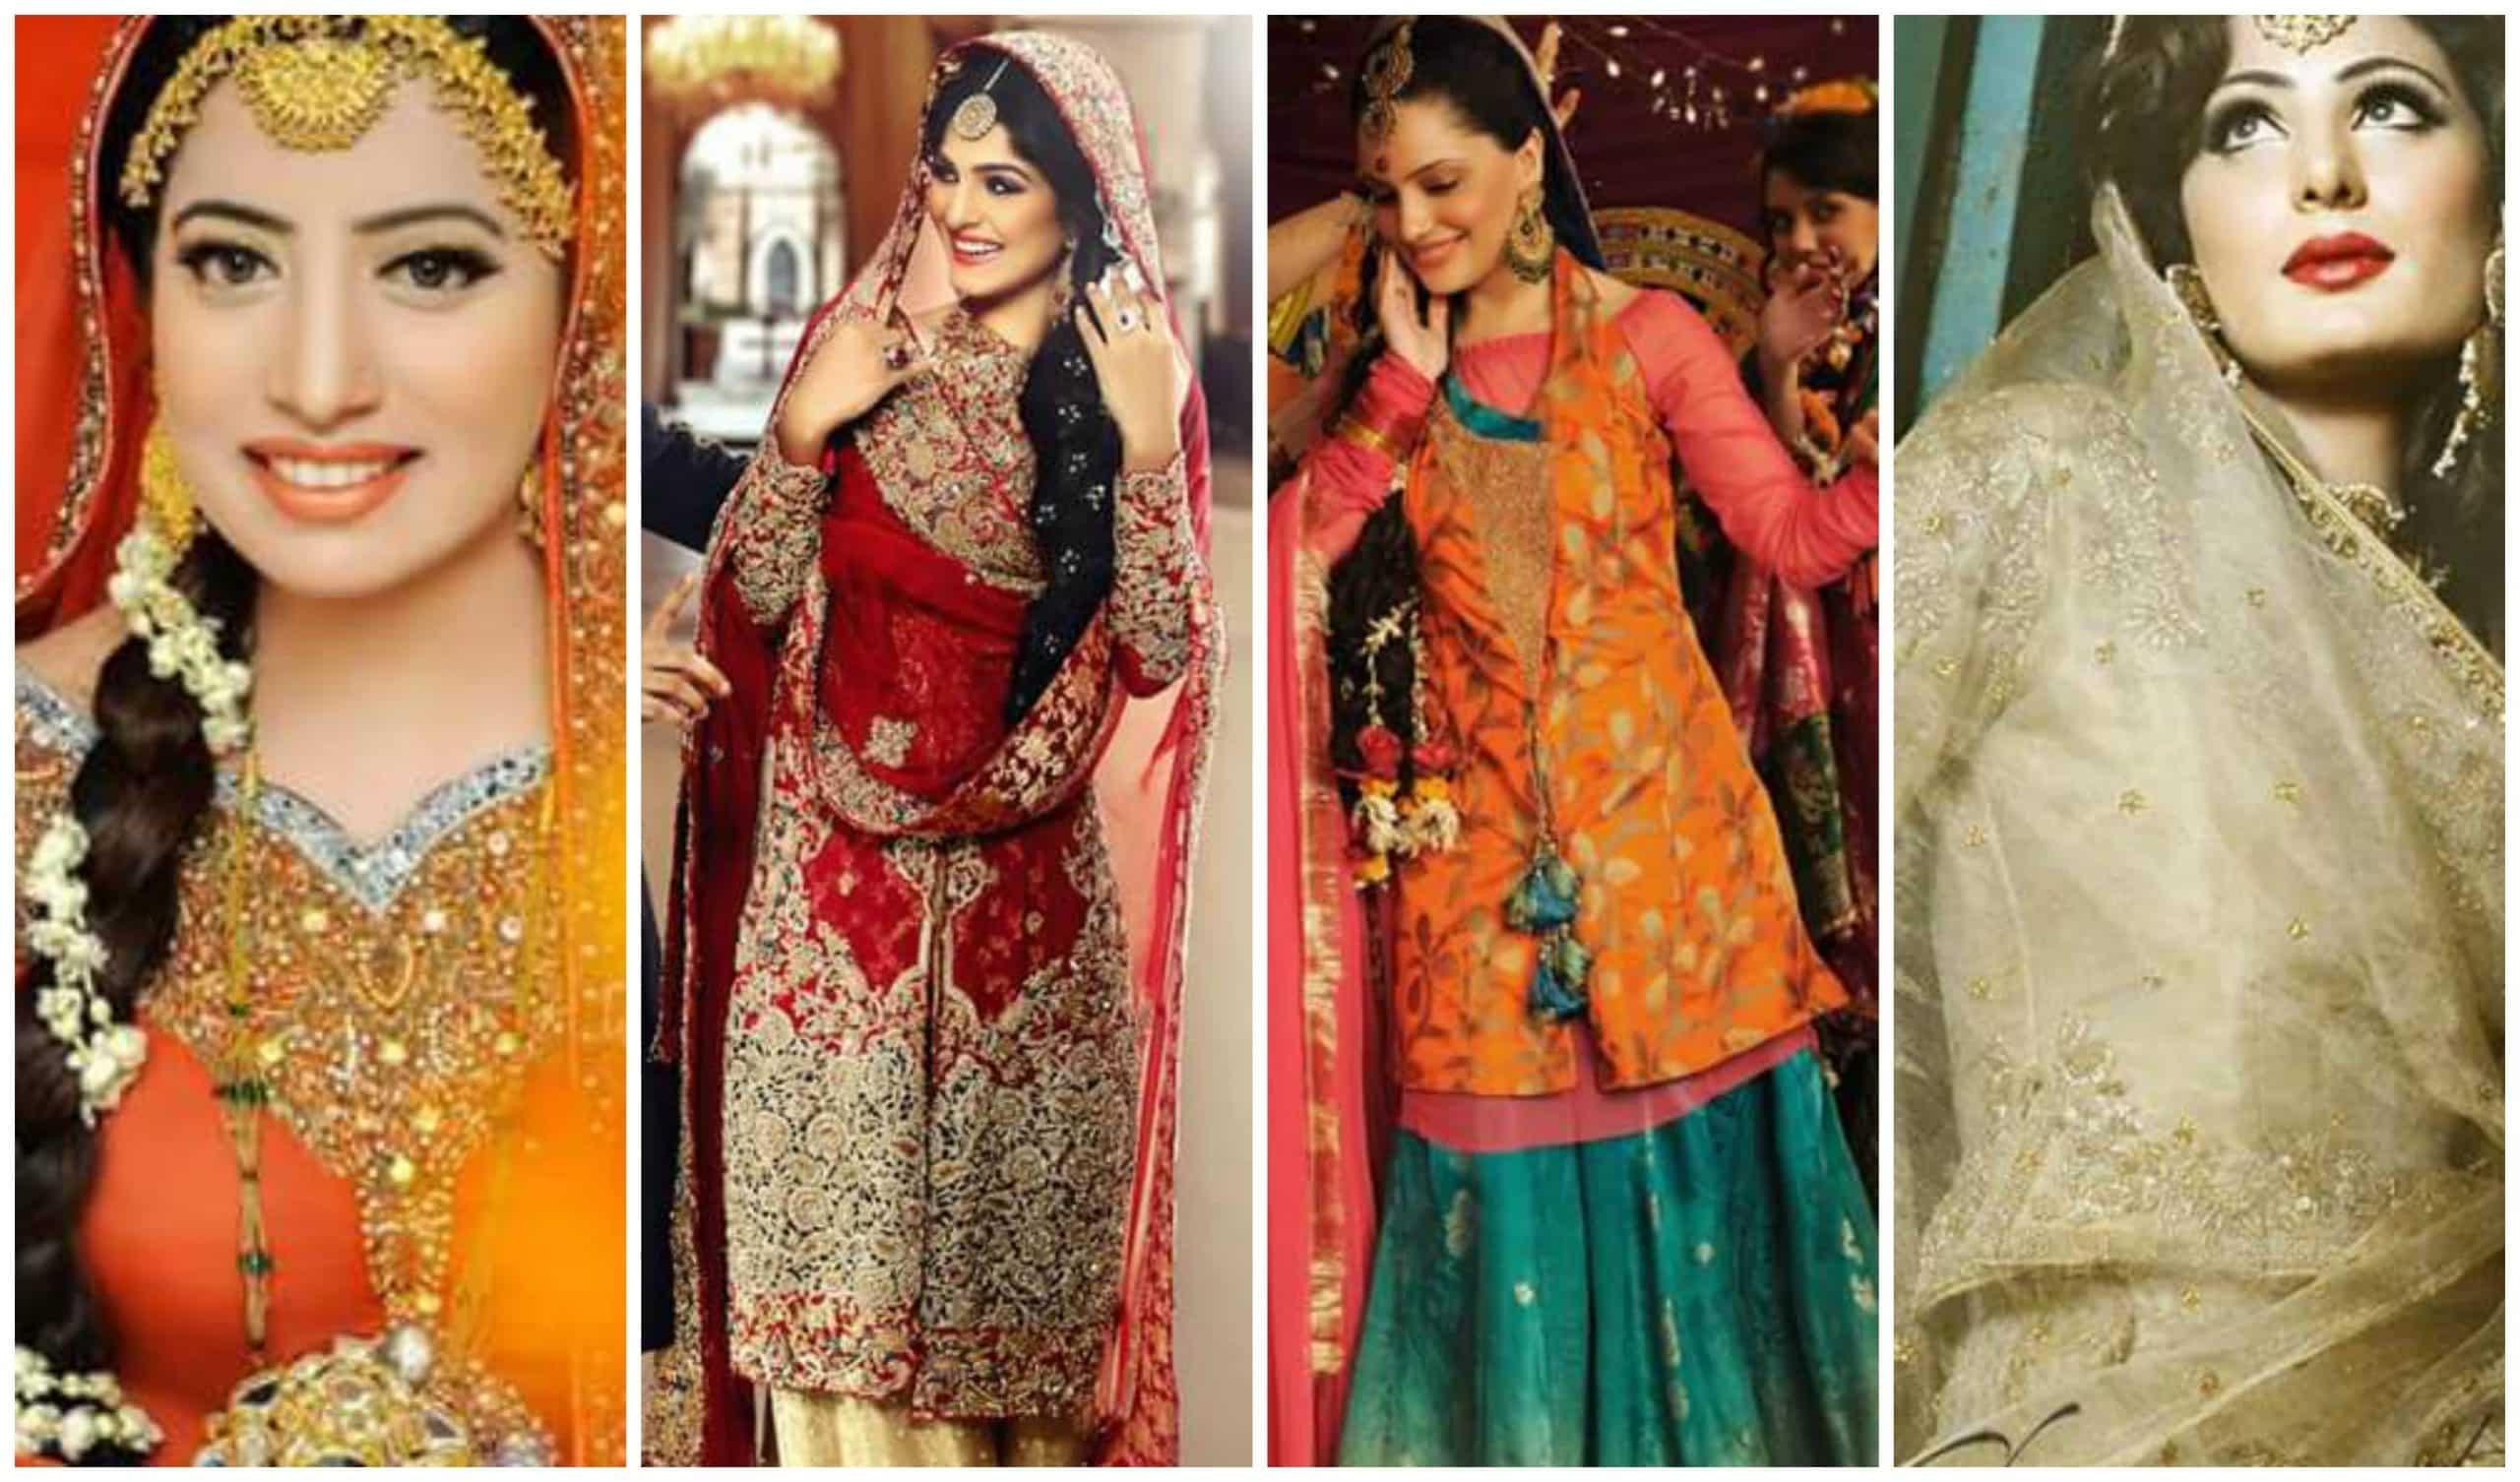 Fashion Central - Pakistan Fashion Shows, Fashion 70